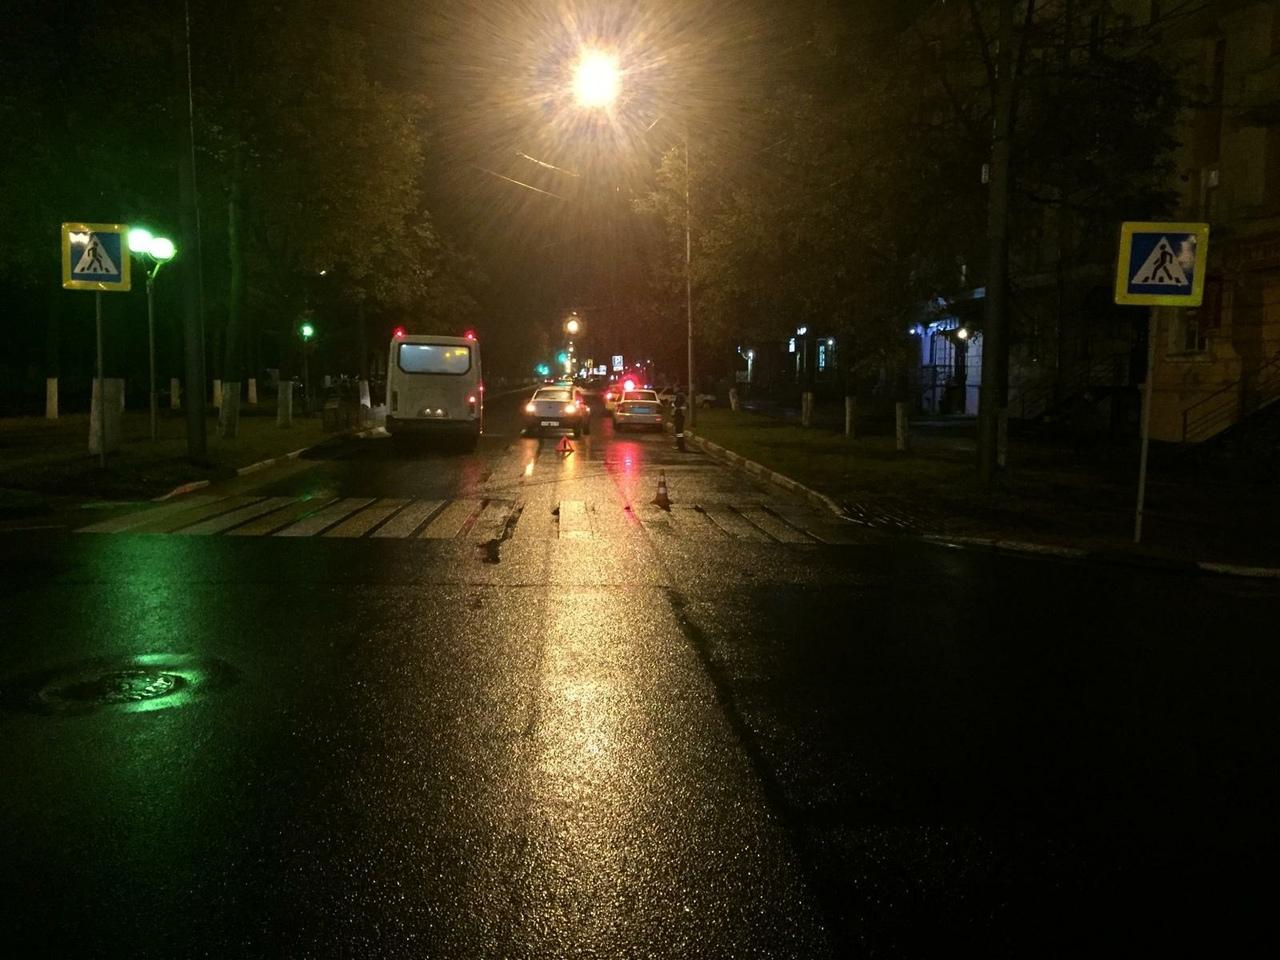 На проспекте Ленина в Ярославле водитель ВАЗа сбил пенсионерку